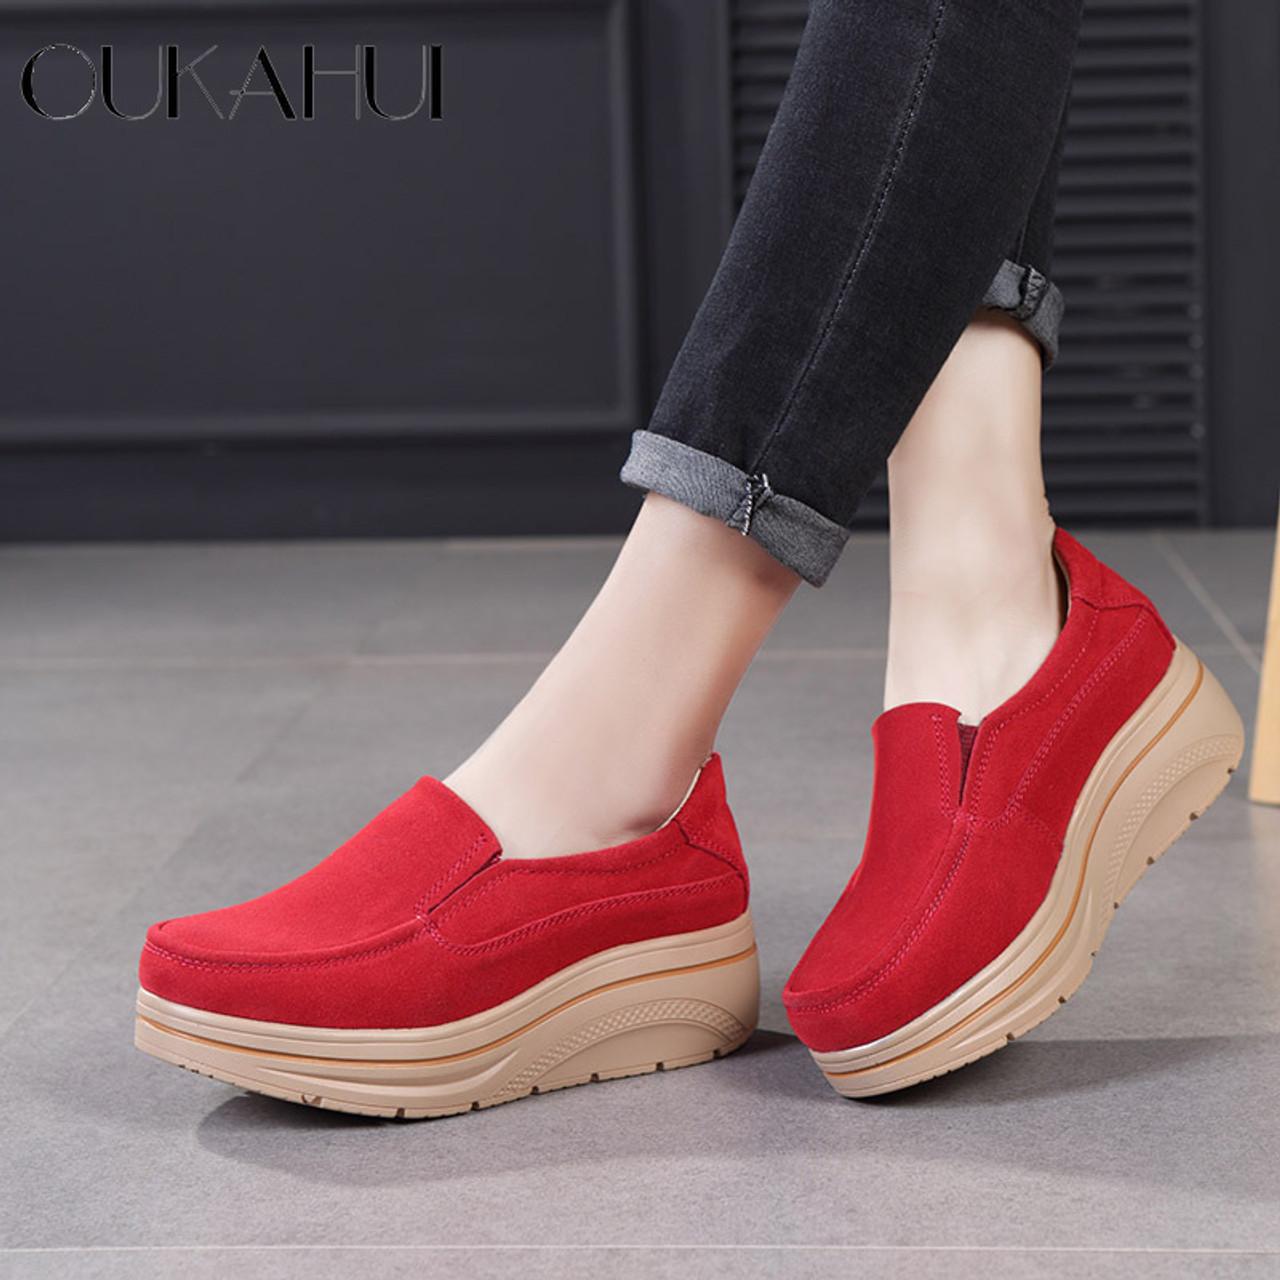 5e4e711f95ee OUKAHUI Autumn Genuine Leather Flat Platform Shoes Women Shake Silp-On 2018  Thick Fashion Increase ...